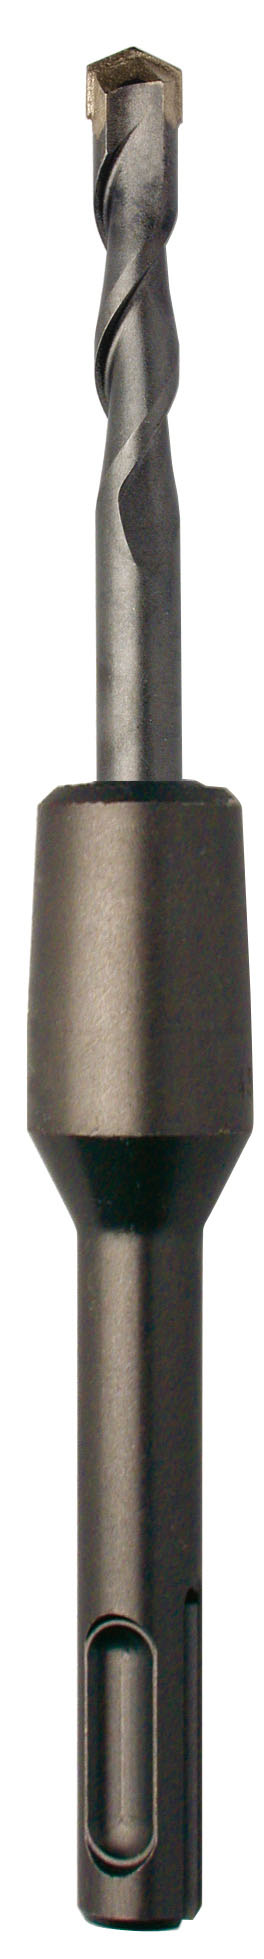 Drilling Core bit adapter Carbide core bit accessories - 328.jpg